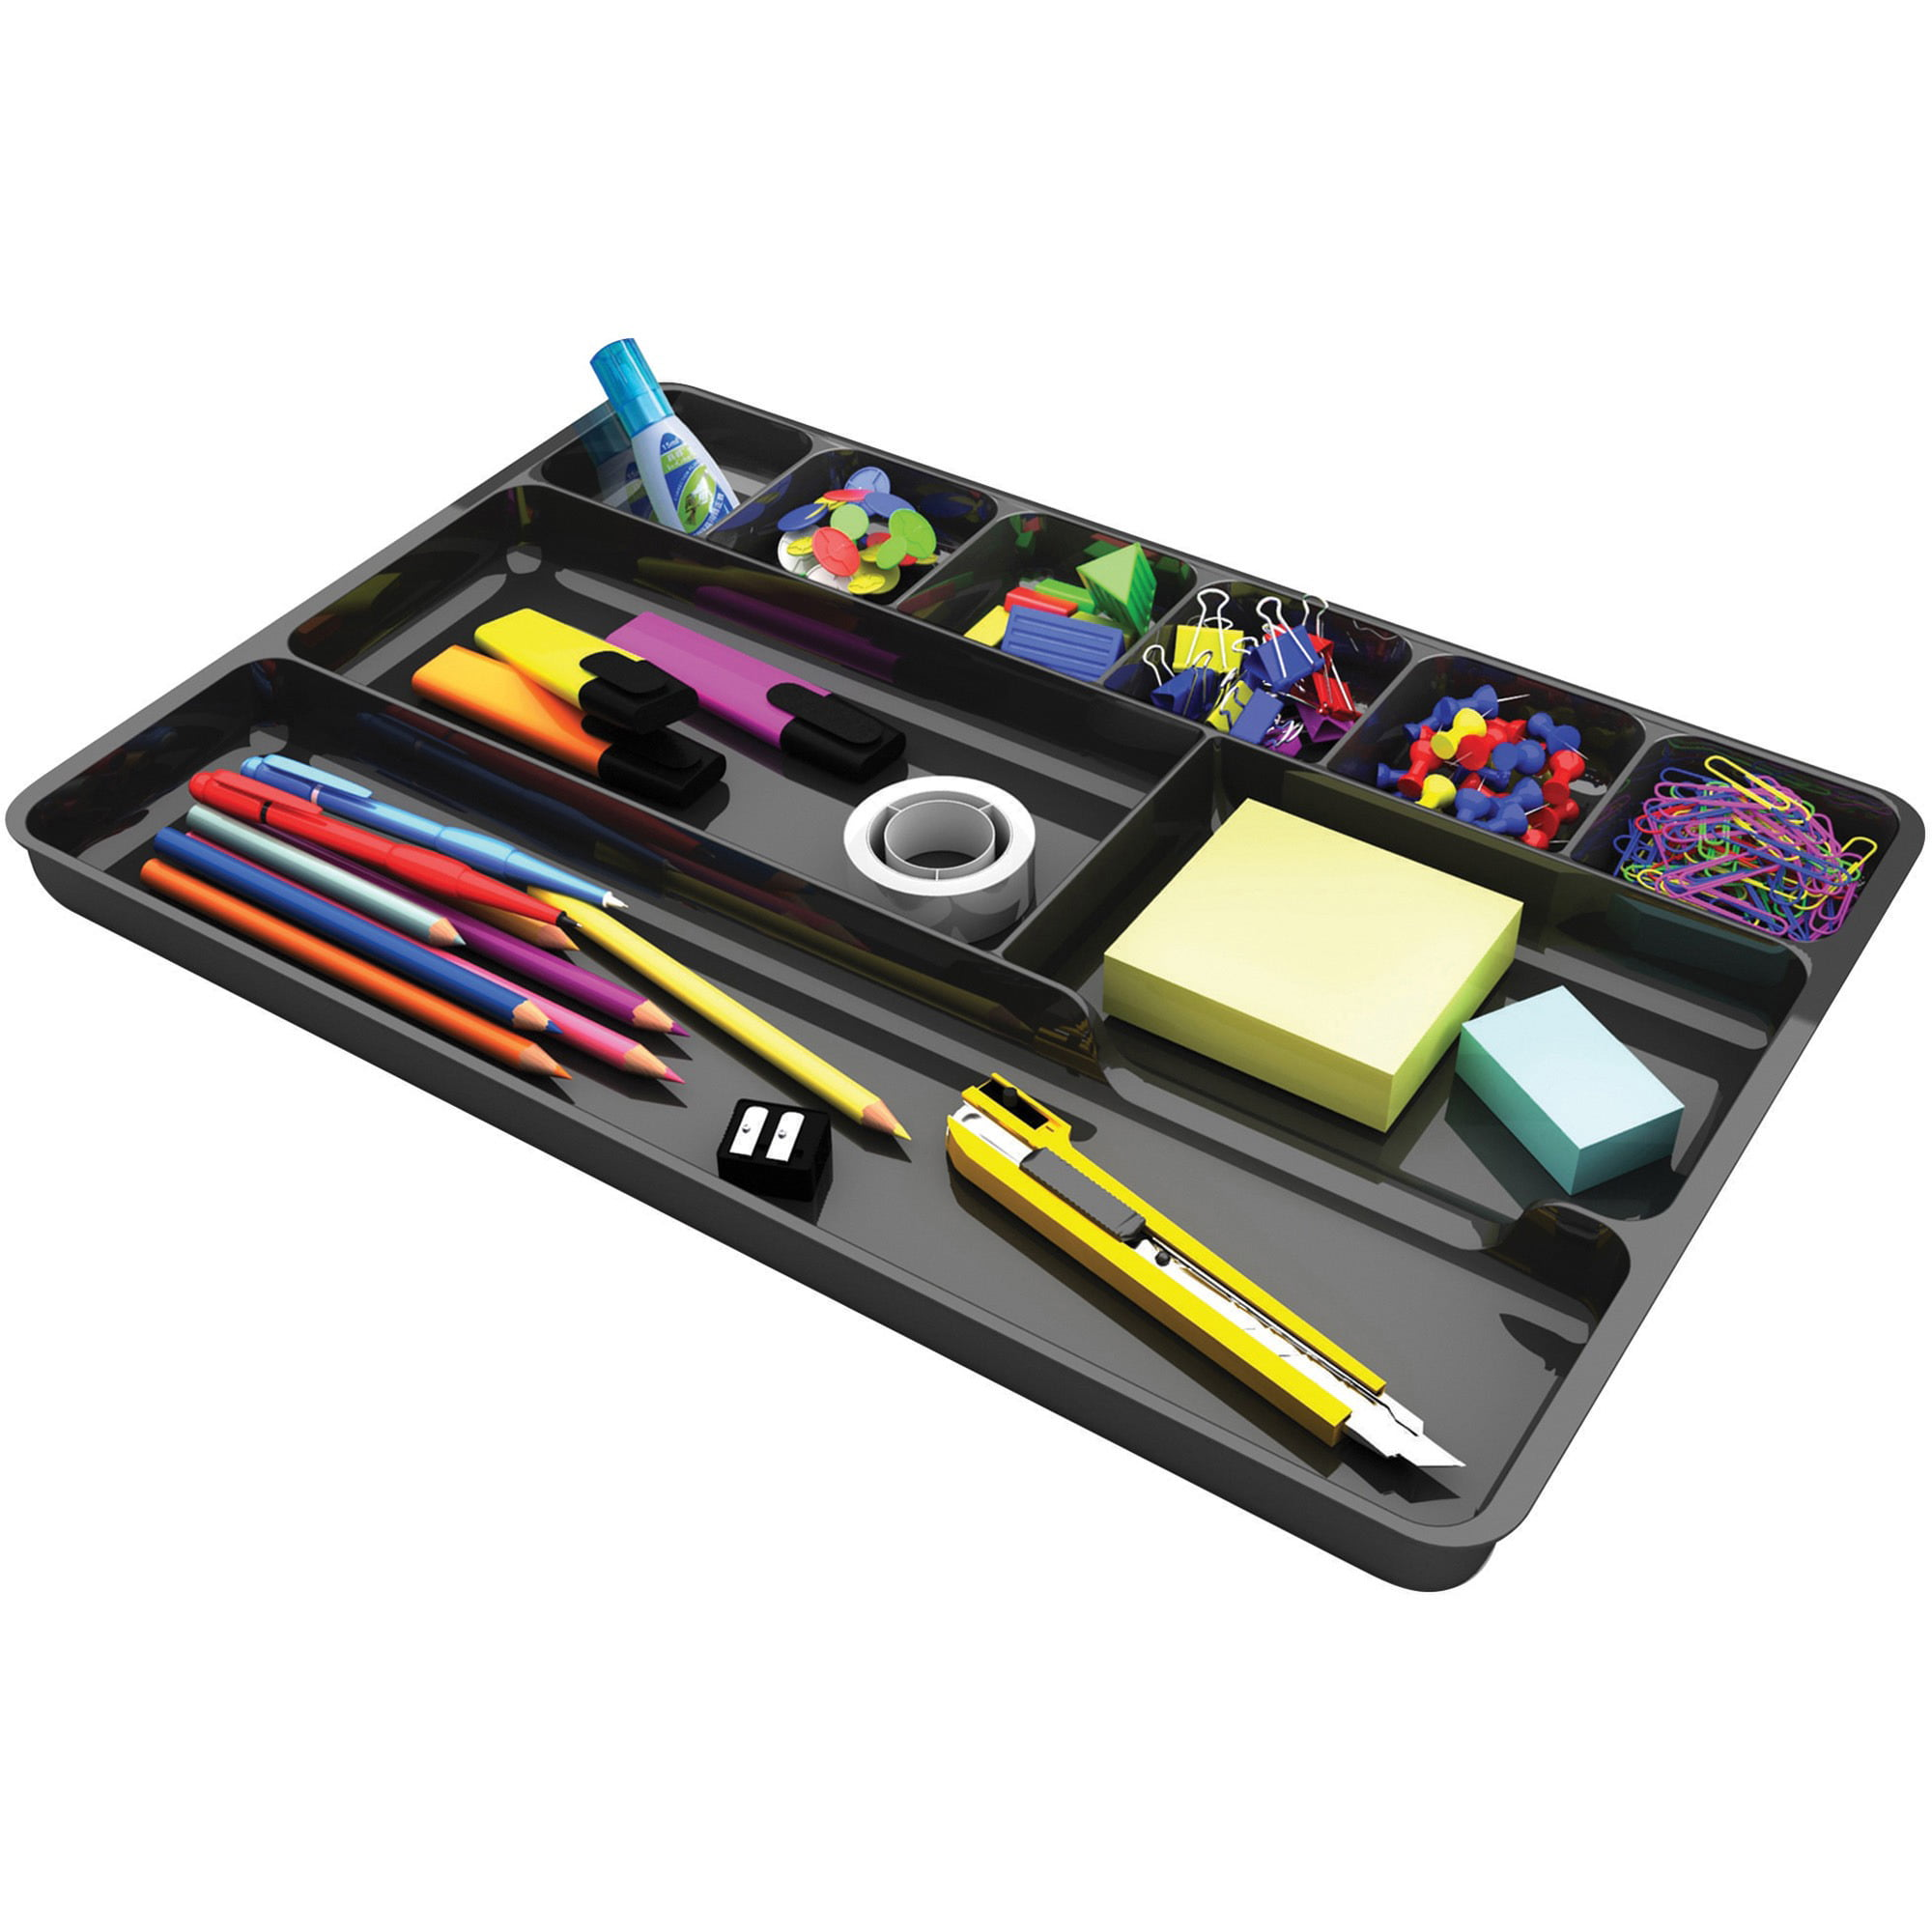 Deflect-O Plastic Desk Drawer Organizer by Deflecto Corporation